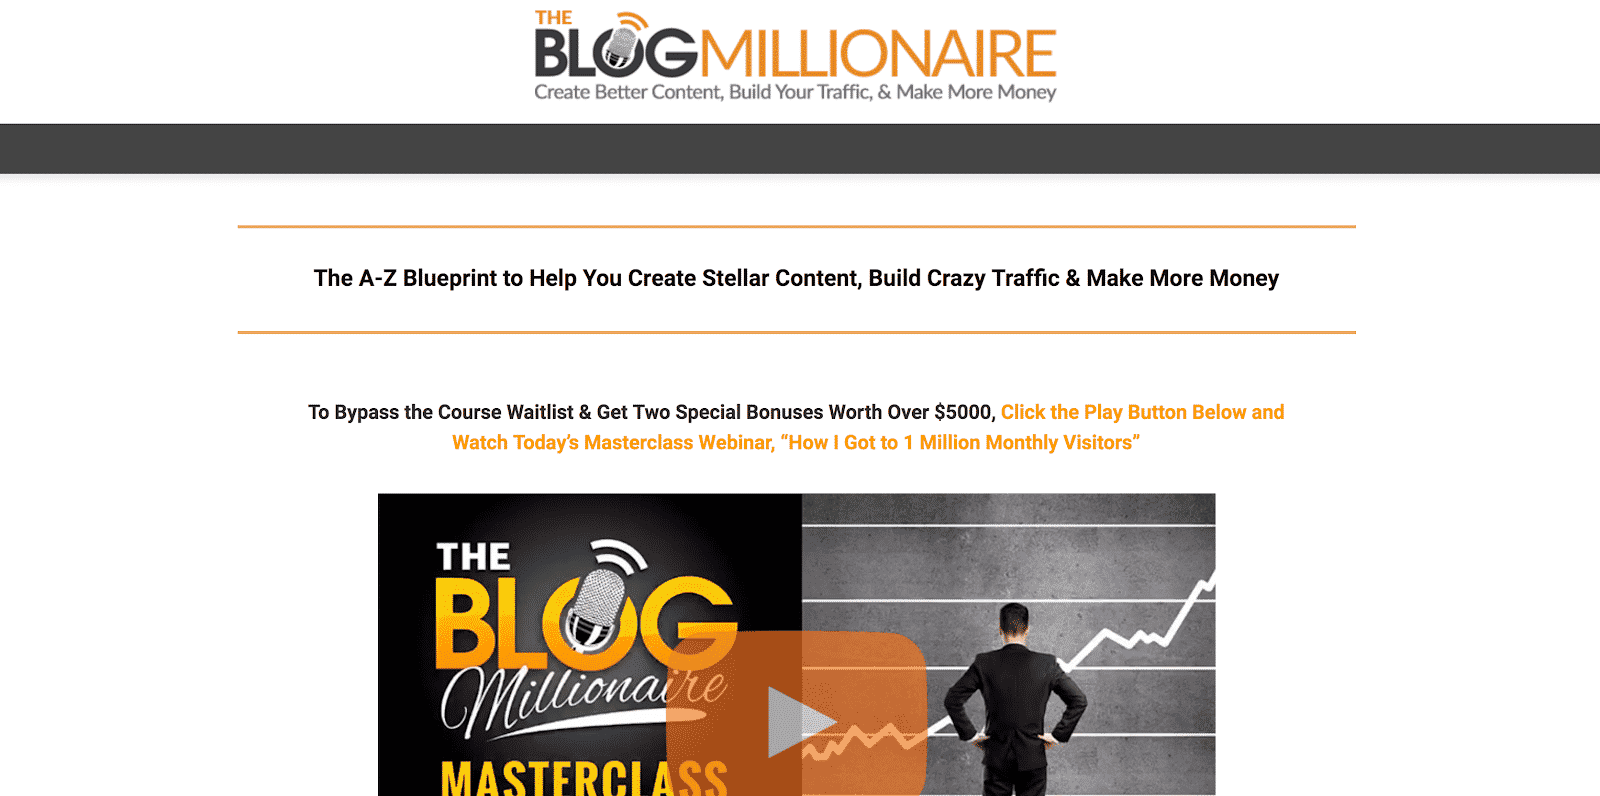 Blog Millionare